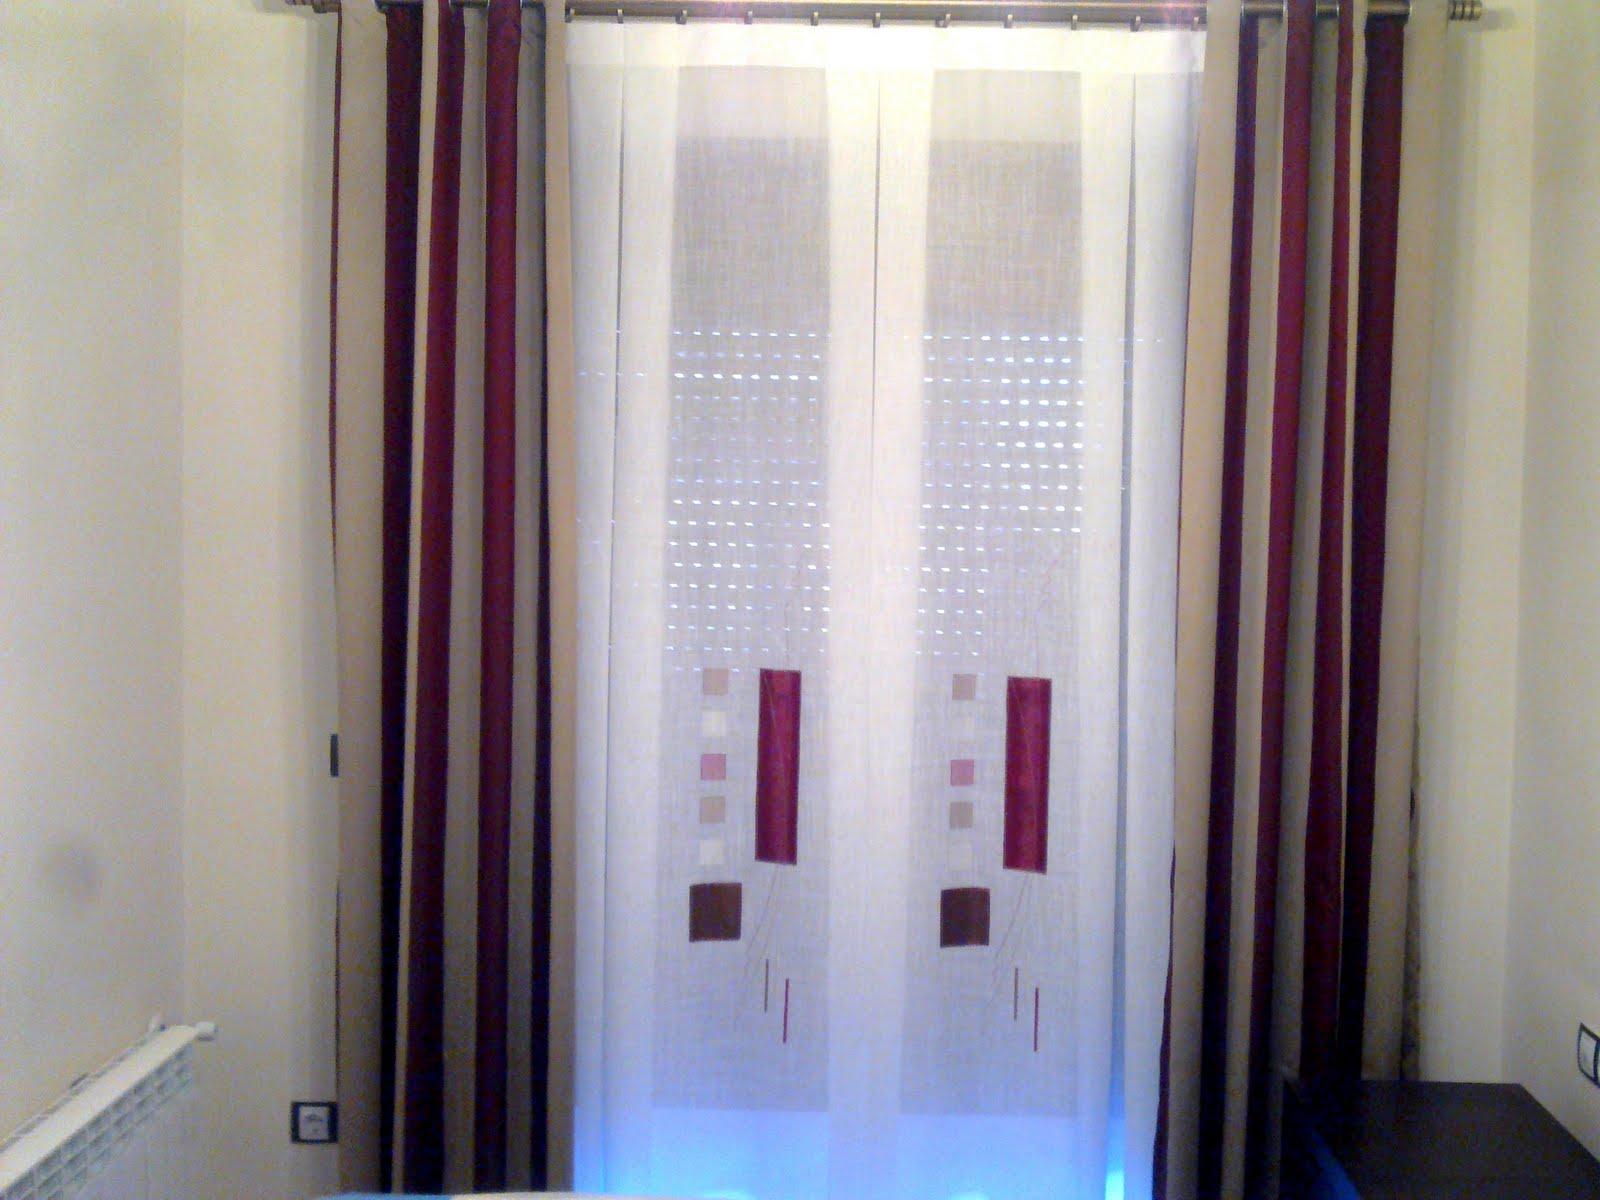 Cortinas para dormitorio matrimonial imagui - Cortinas modernas para dormitorios ...